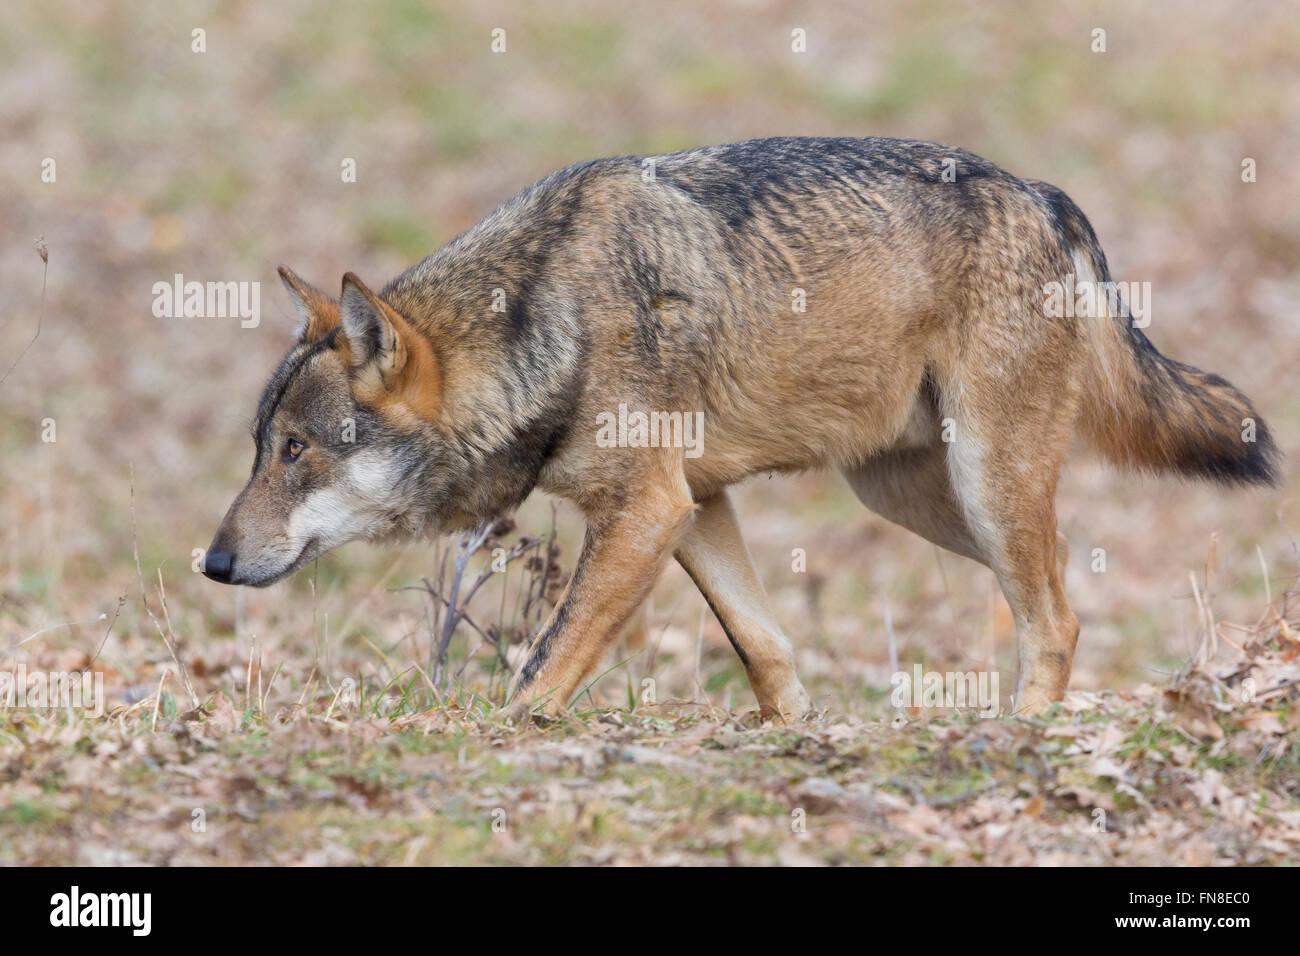 Italian Wolf (Canis lupus italicus), captive animal walking, Civitella Alfedena, Abruzzo, Italy Stock Photo